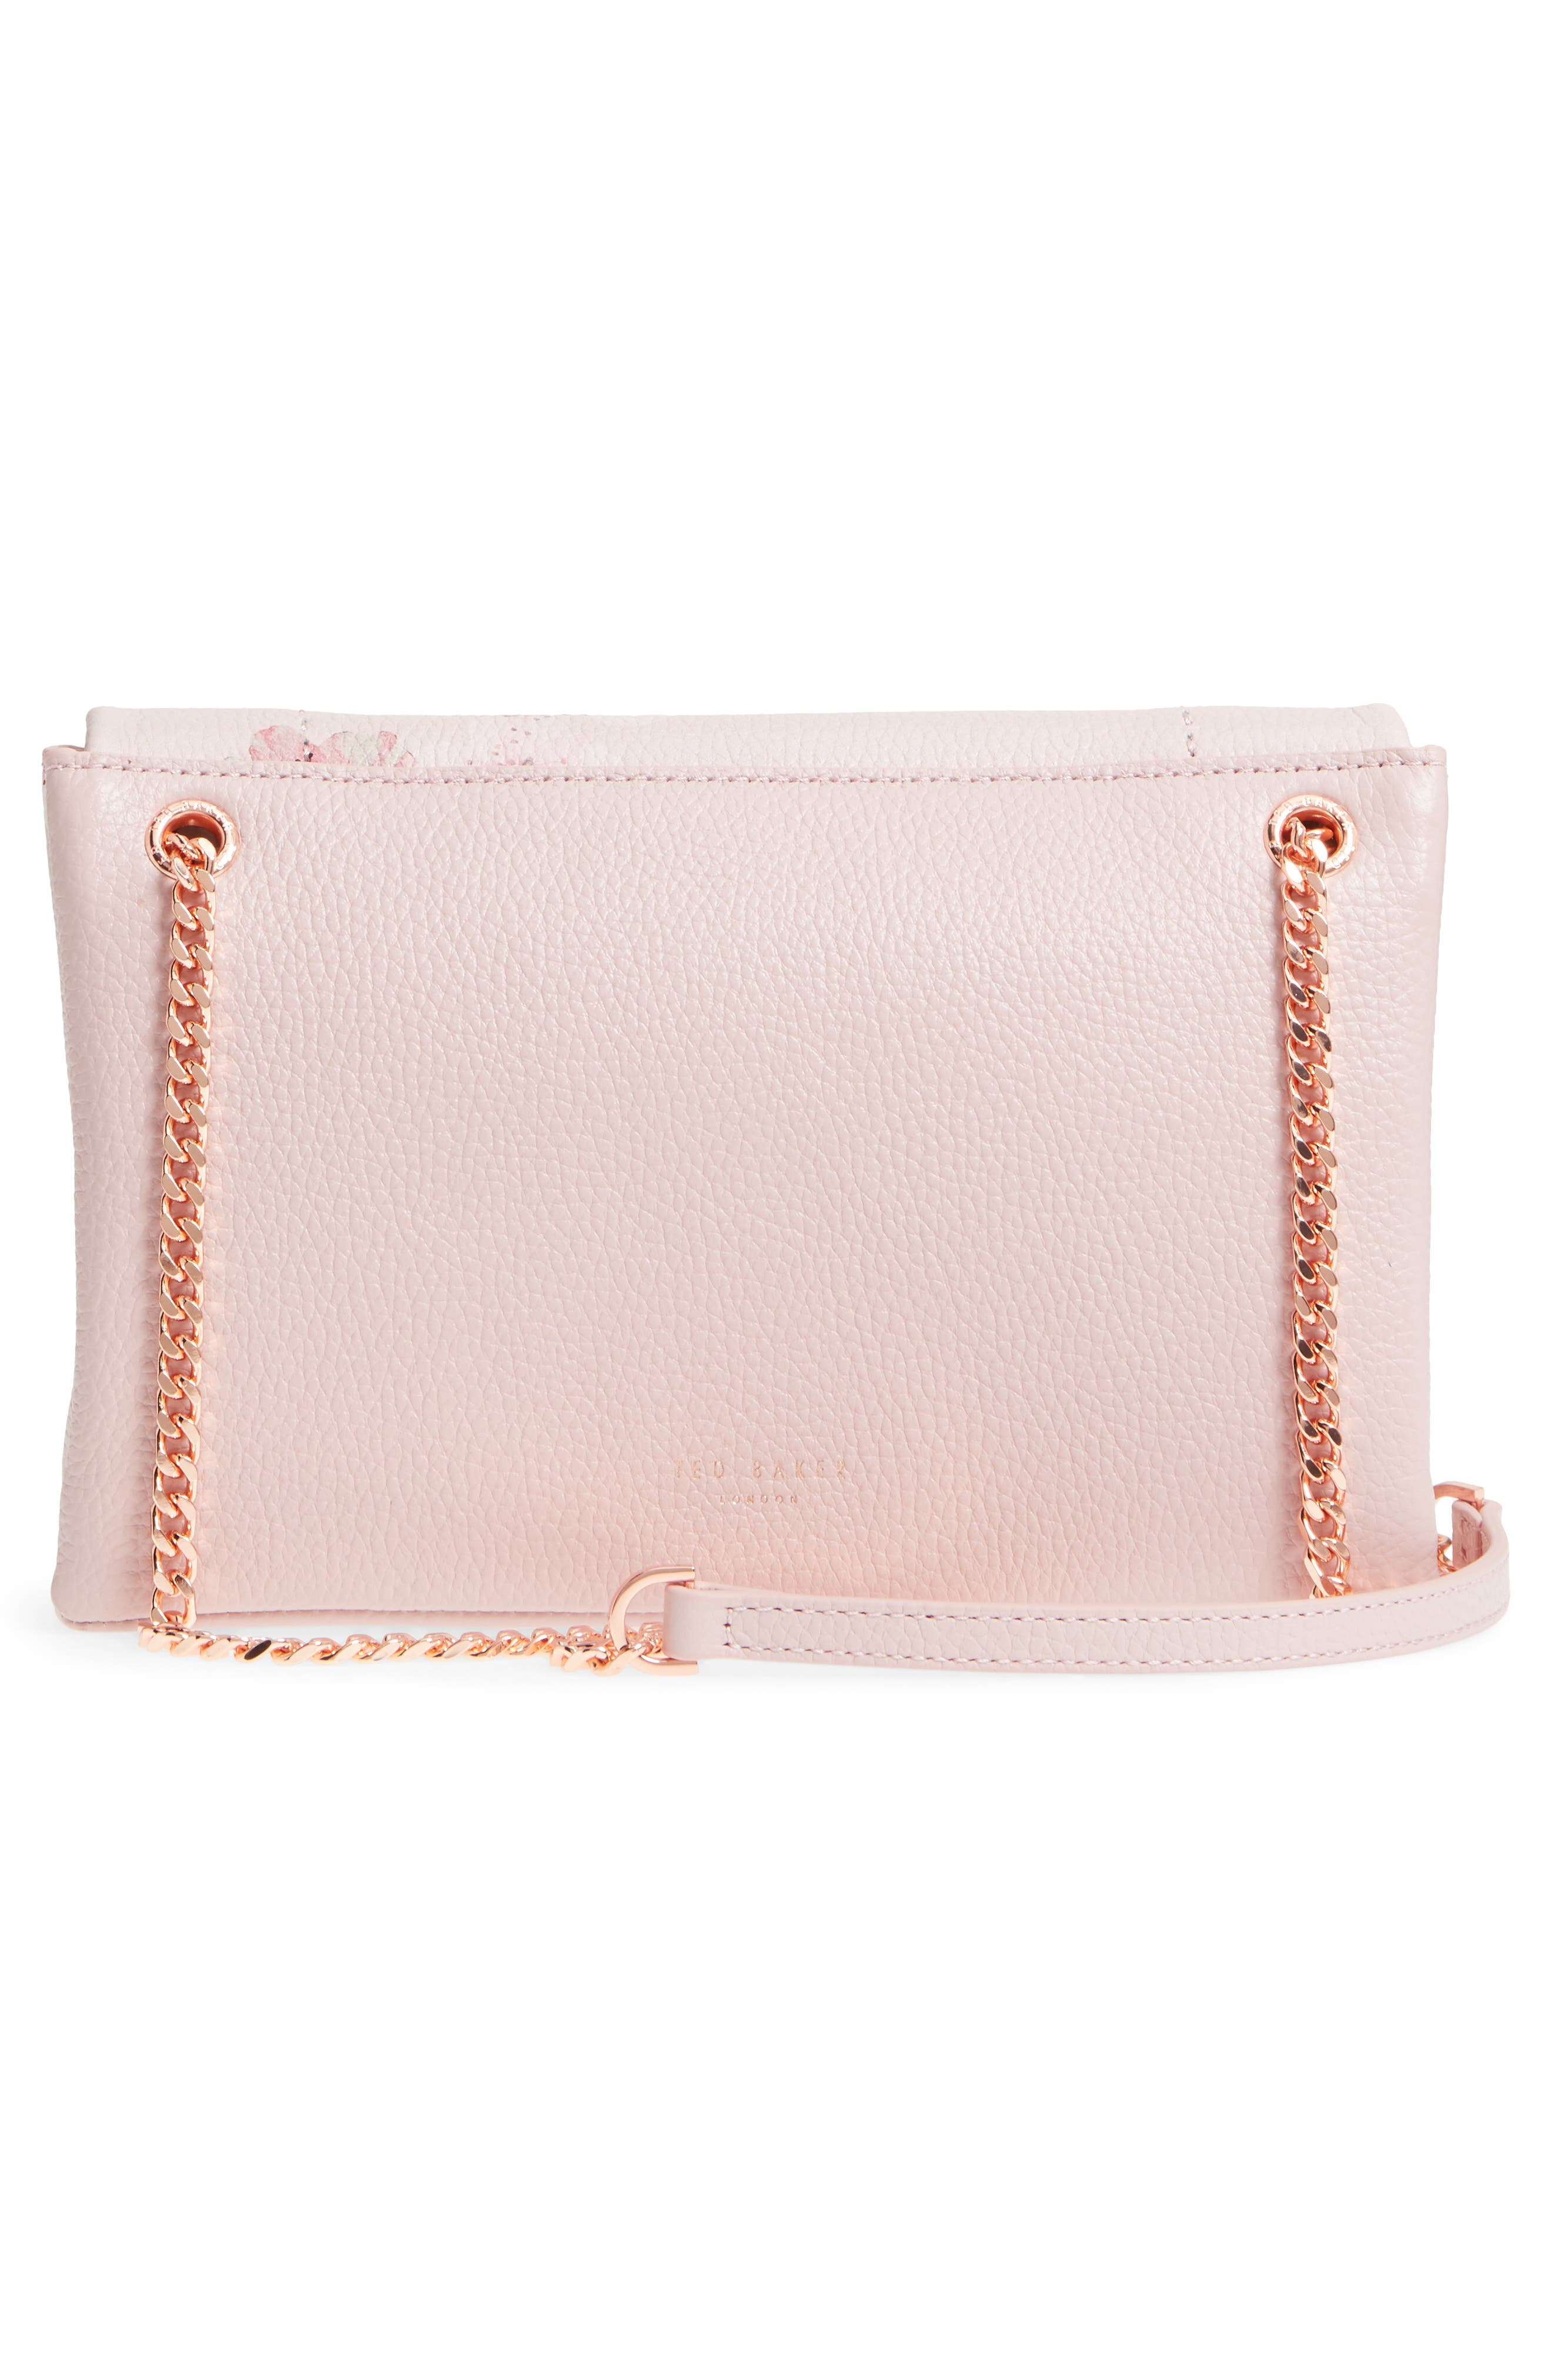 Alternate Image 3  - Ted Baker London Jayy Soft Blossom Leather Crossbody Bag